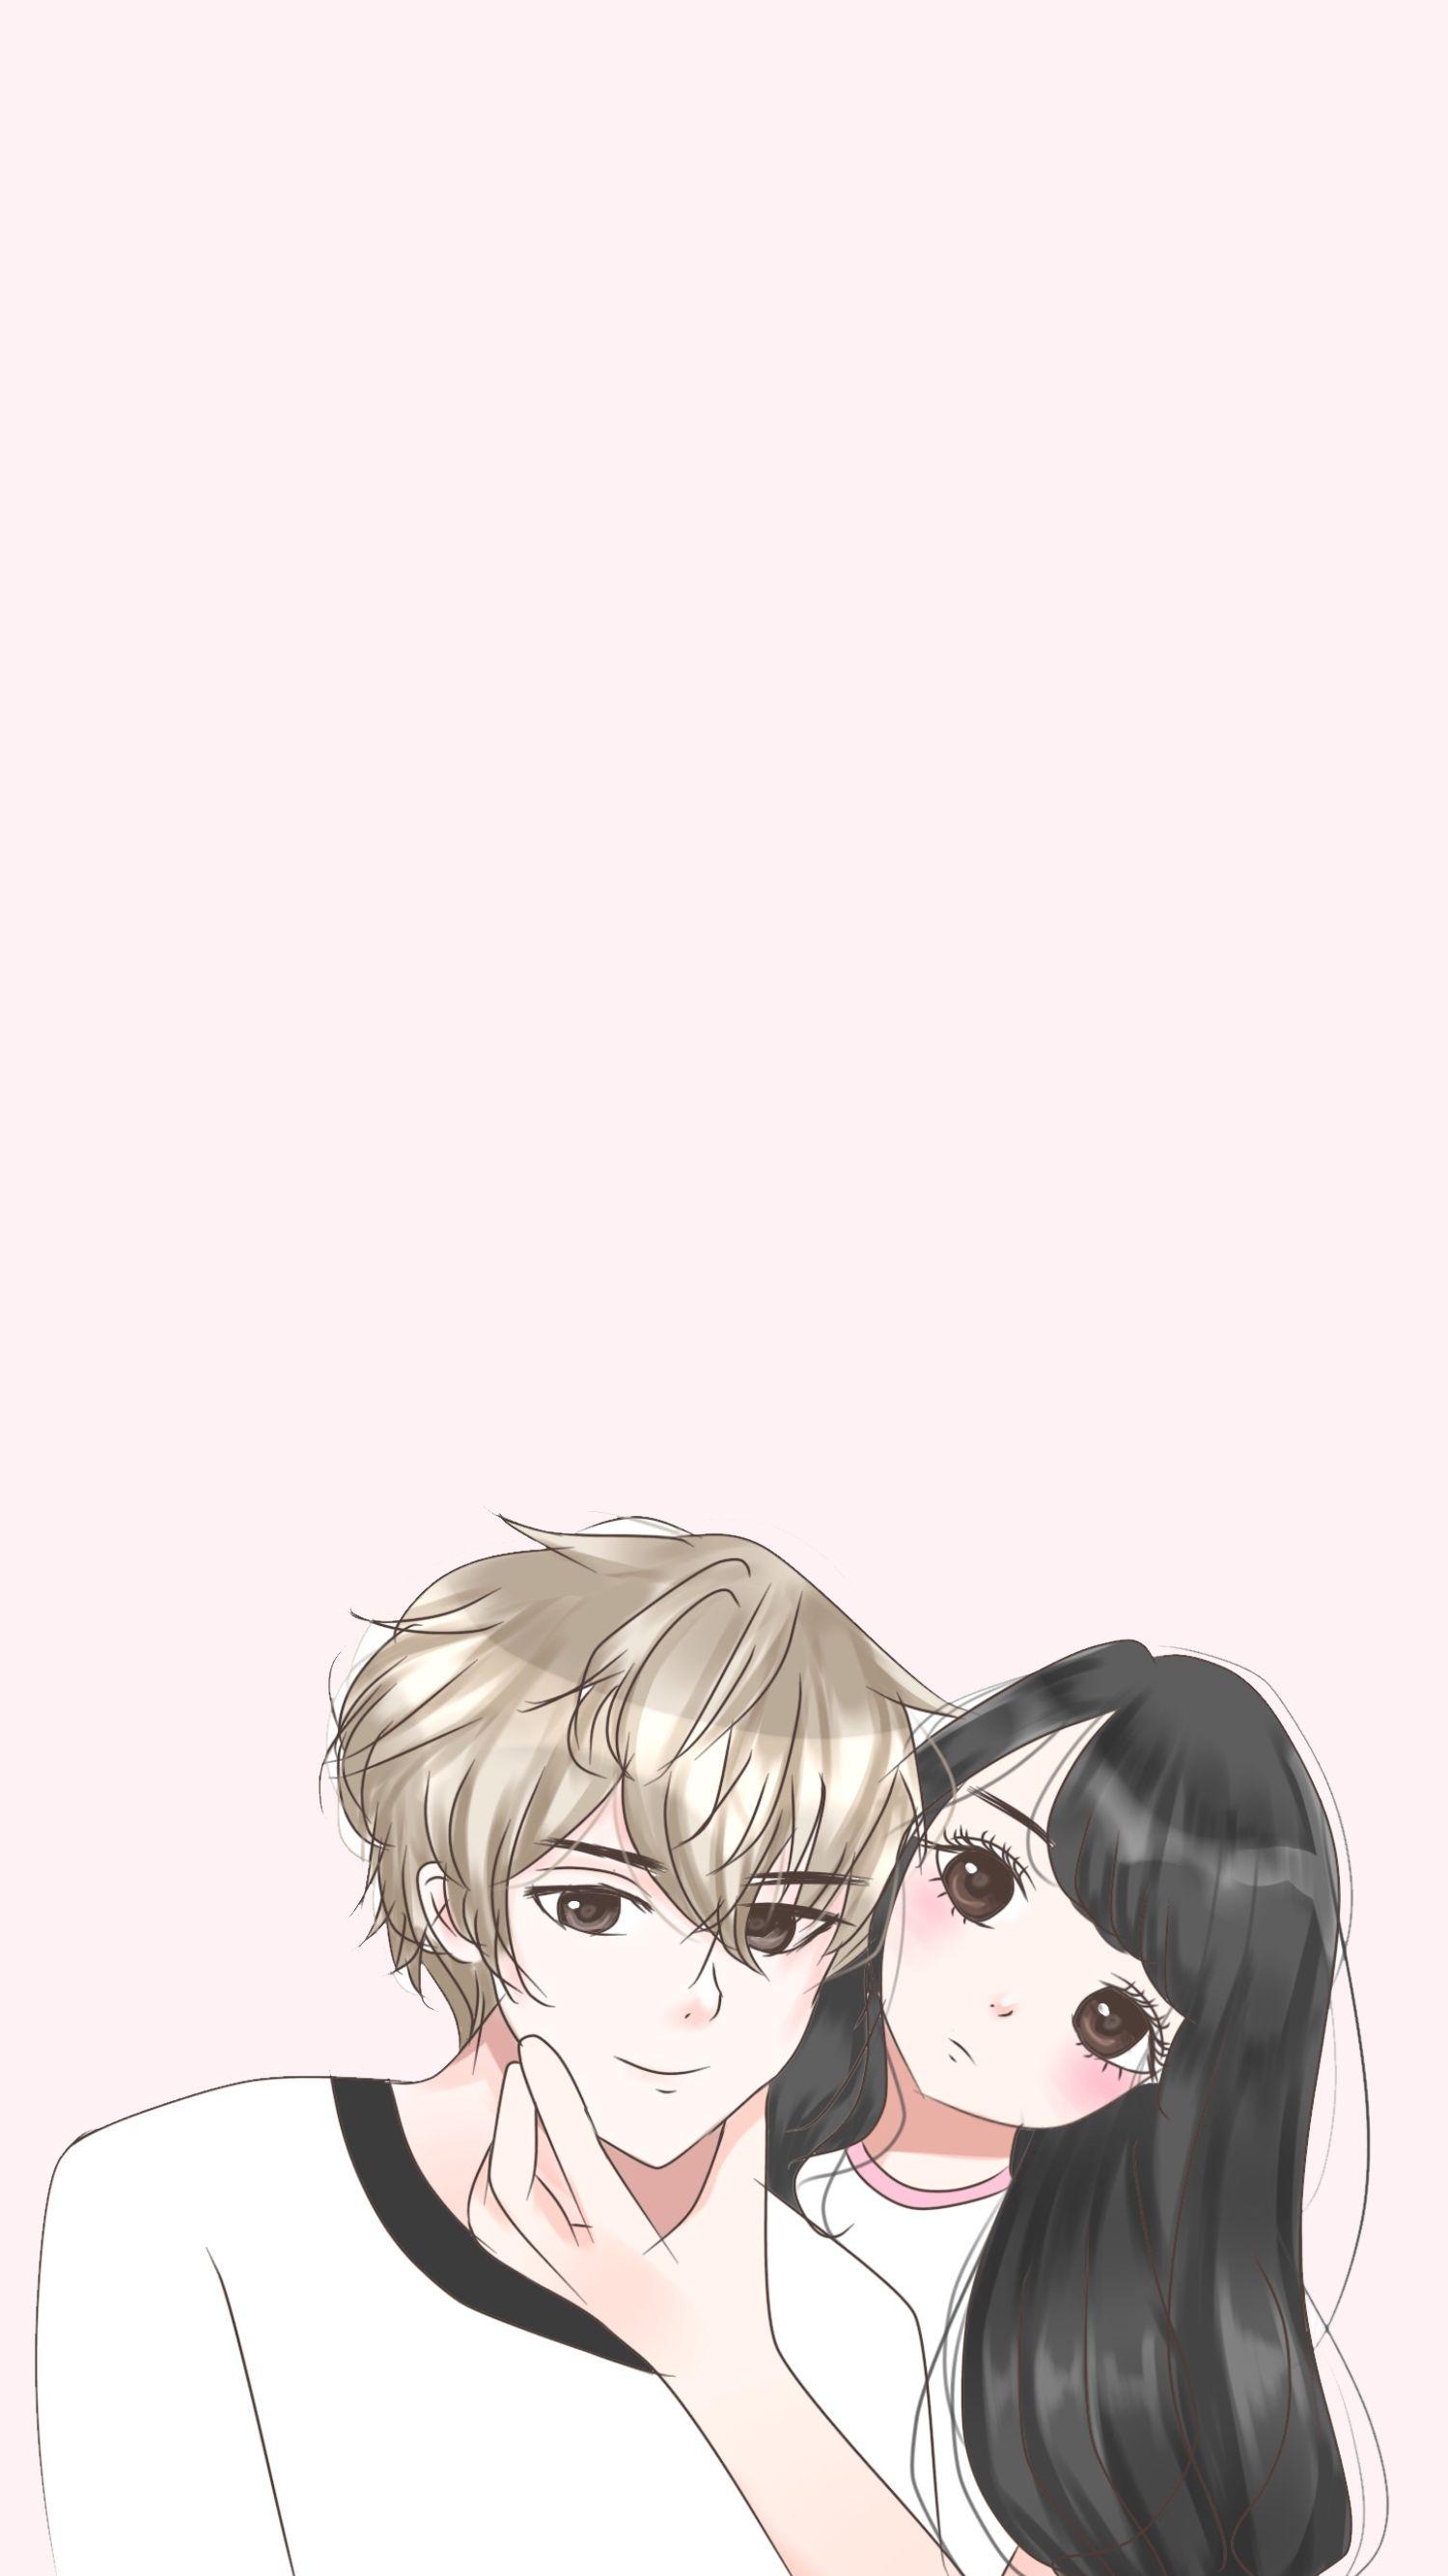 Girl Boy Couple Cute Illustration Anime Cover Wattpad Ilustrasi Karakter Ilustrasi Seni Animasi